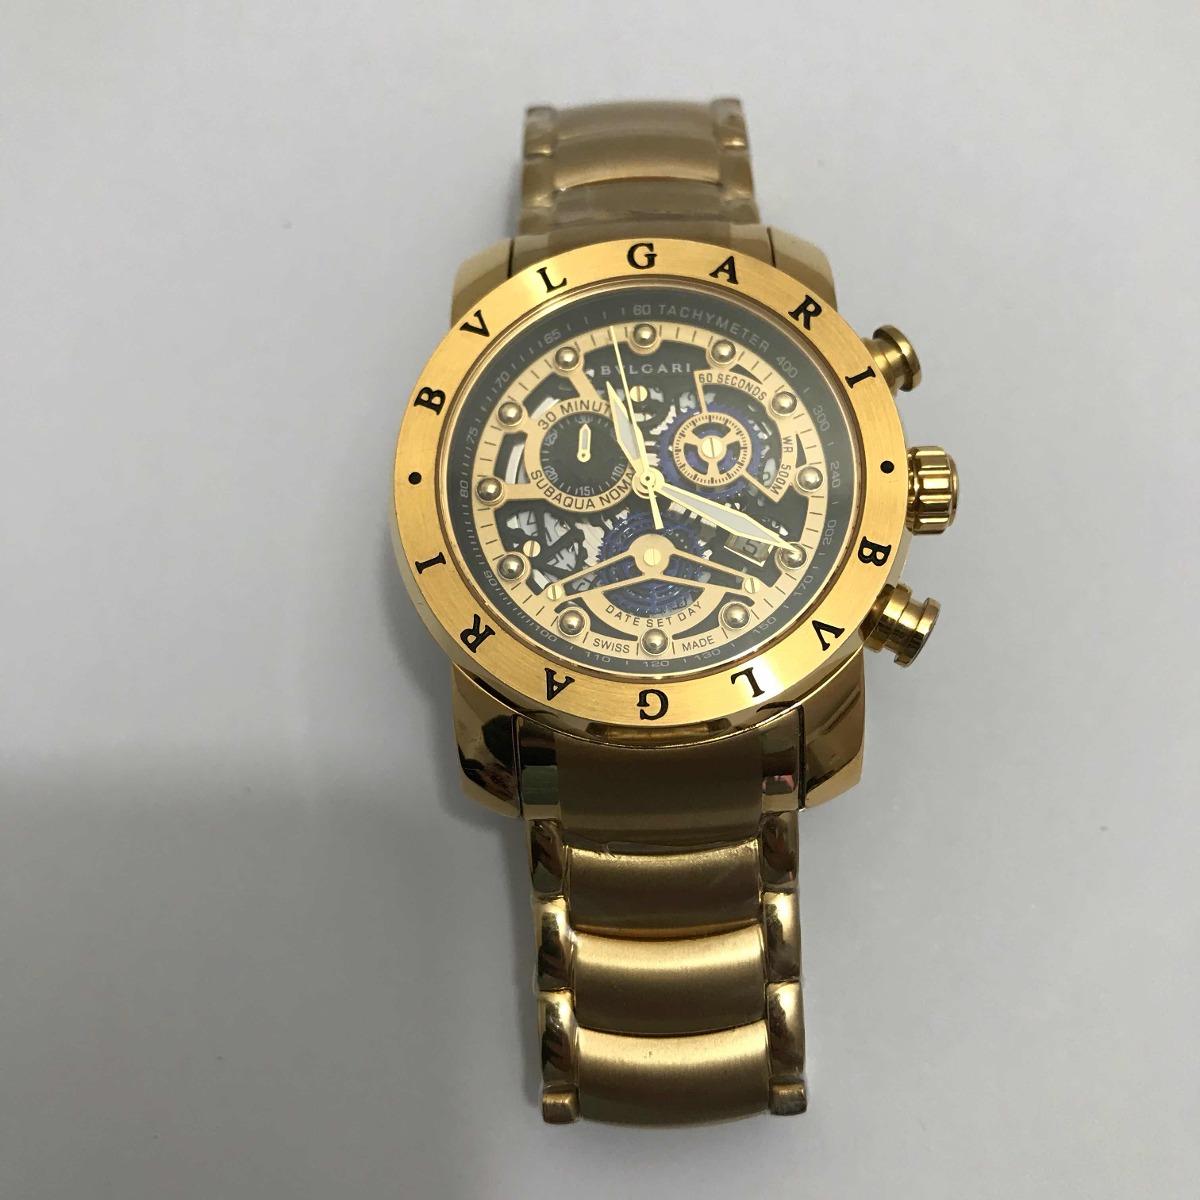 5286dc8bb29 relógio bvlgari iron man esqueleto dourado fundo preto. Carregando zoom.